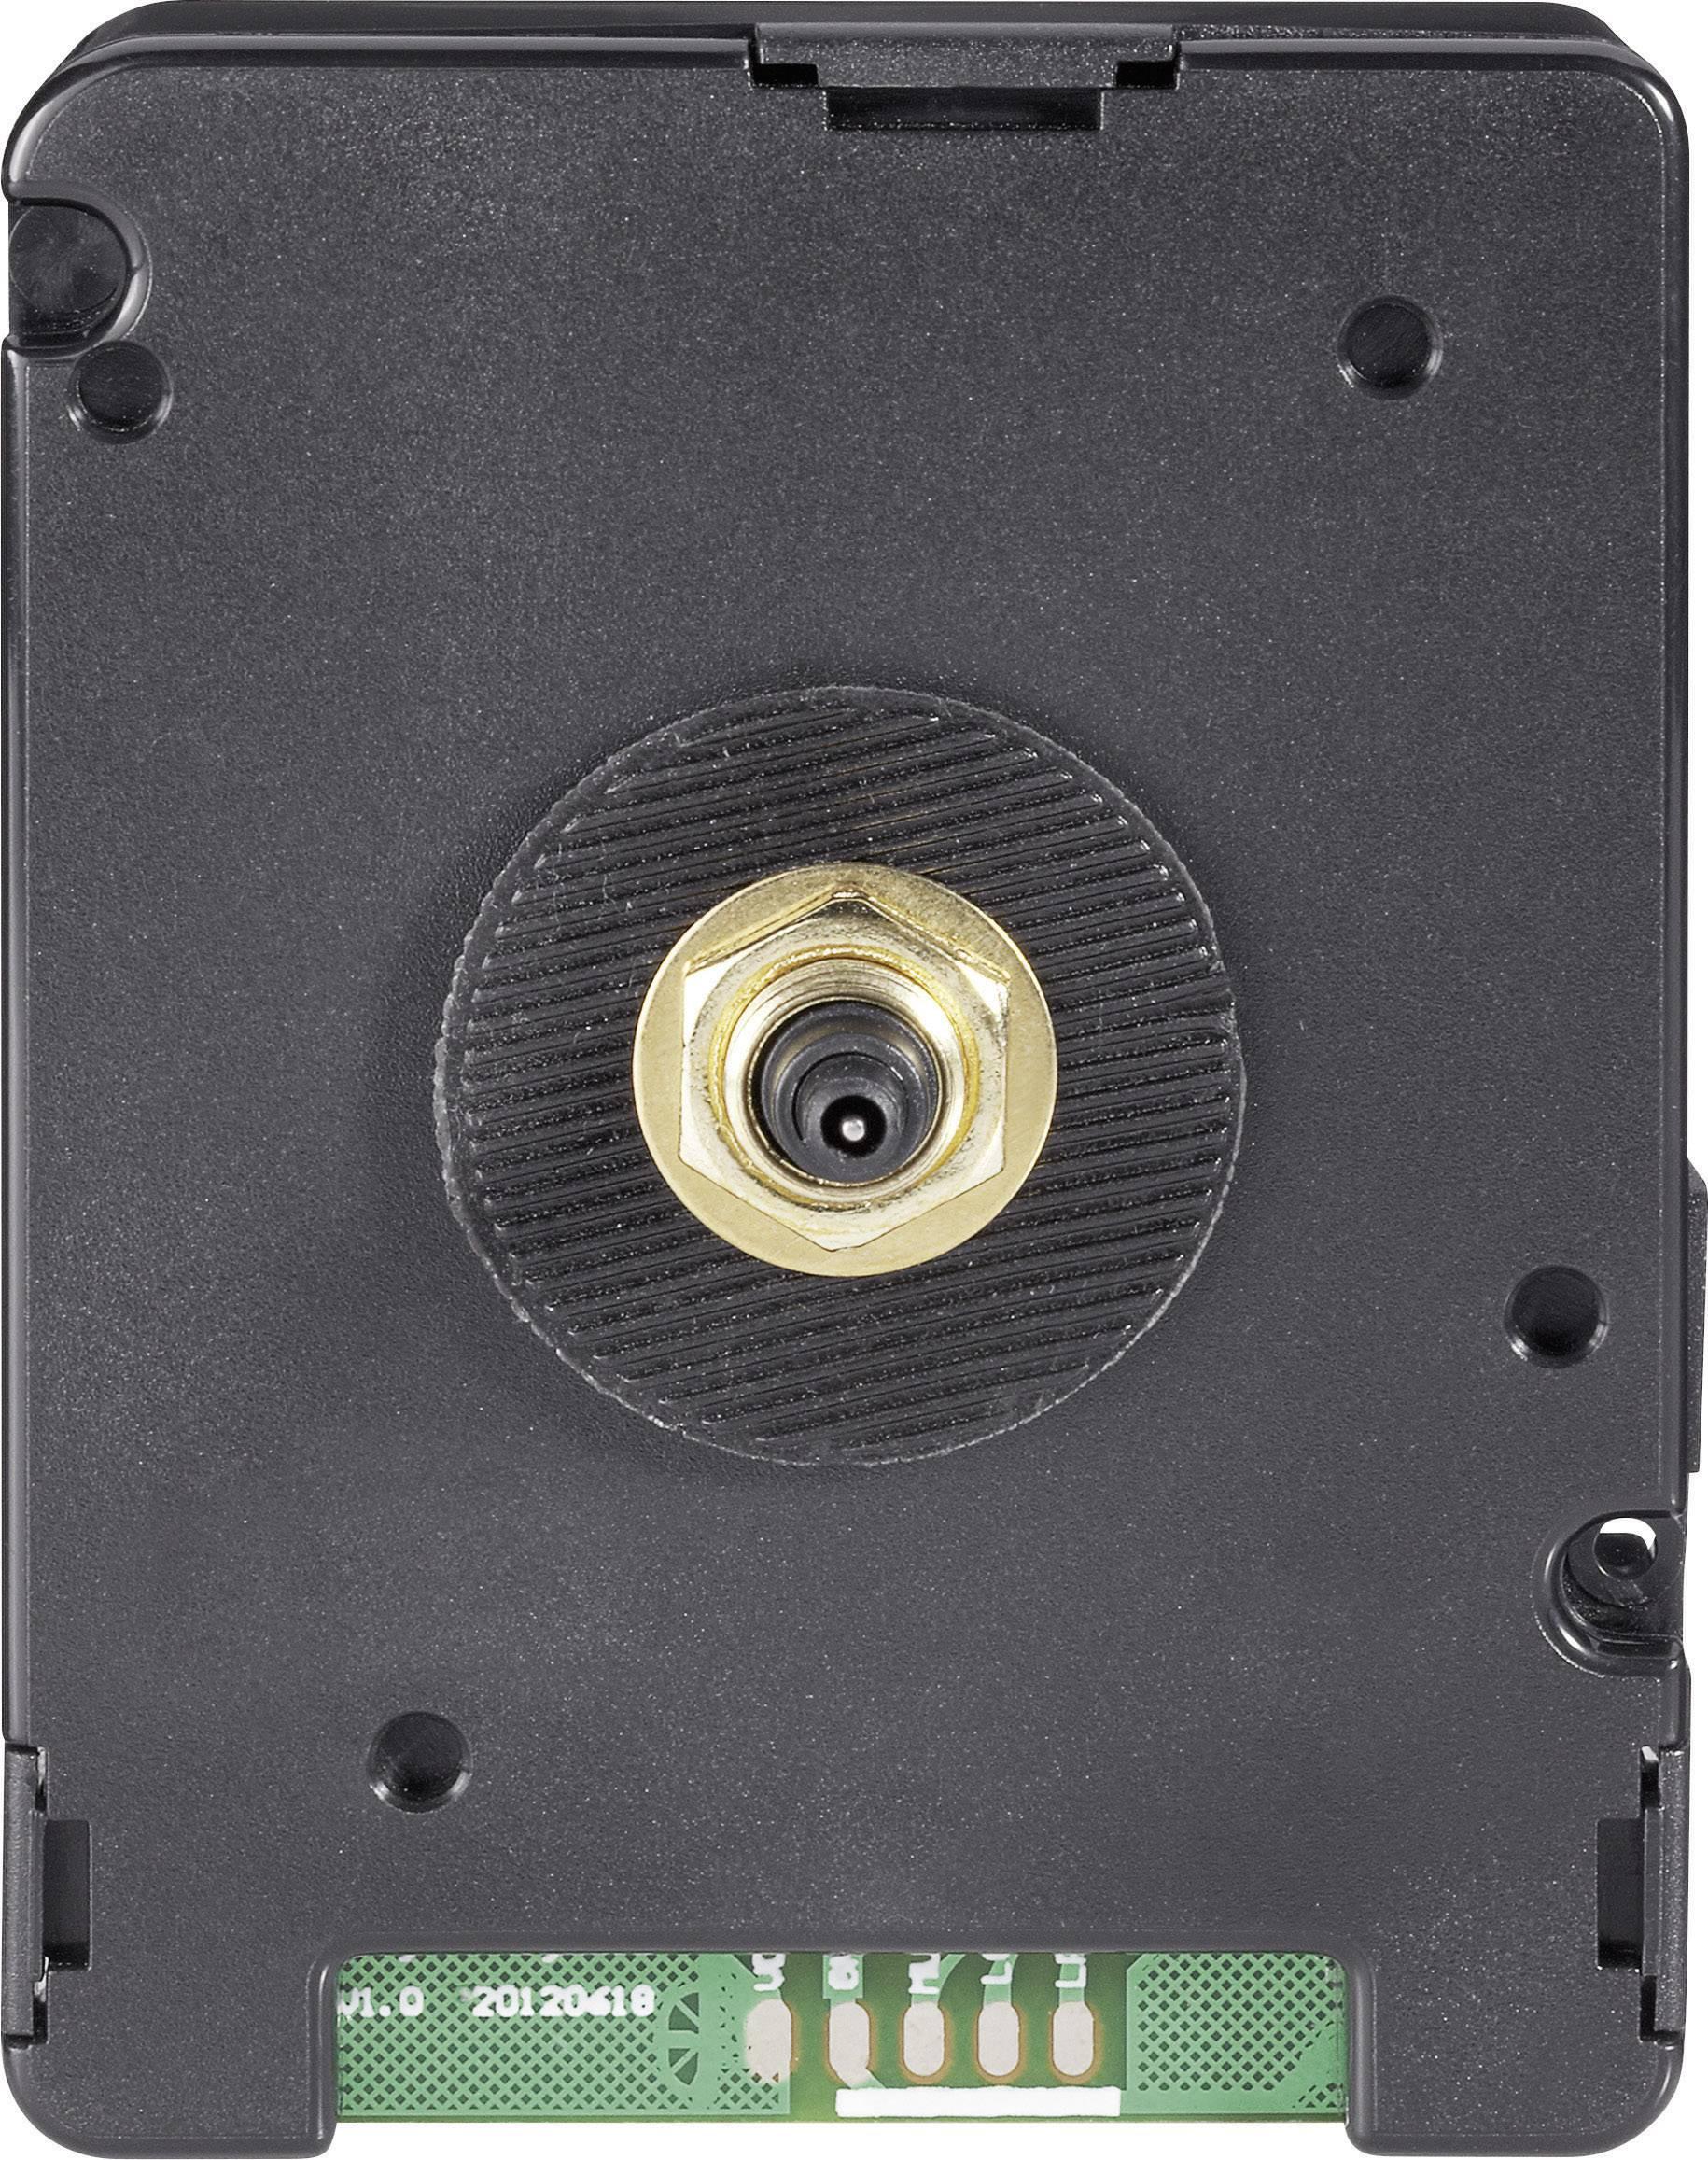 DCF hodinový strojček so sekundovou ručičkou HD 1688FRC 9080c25c,17 mm